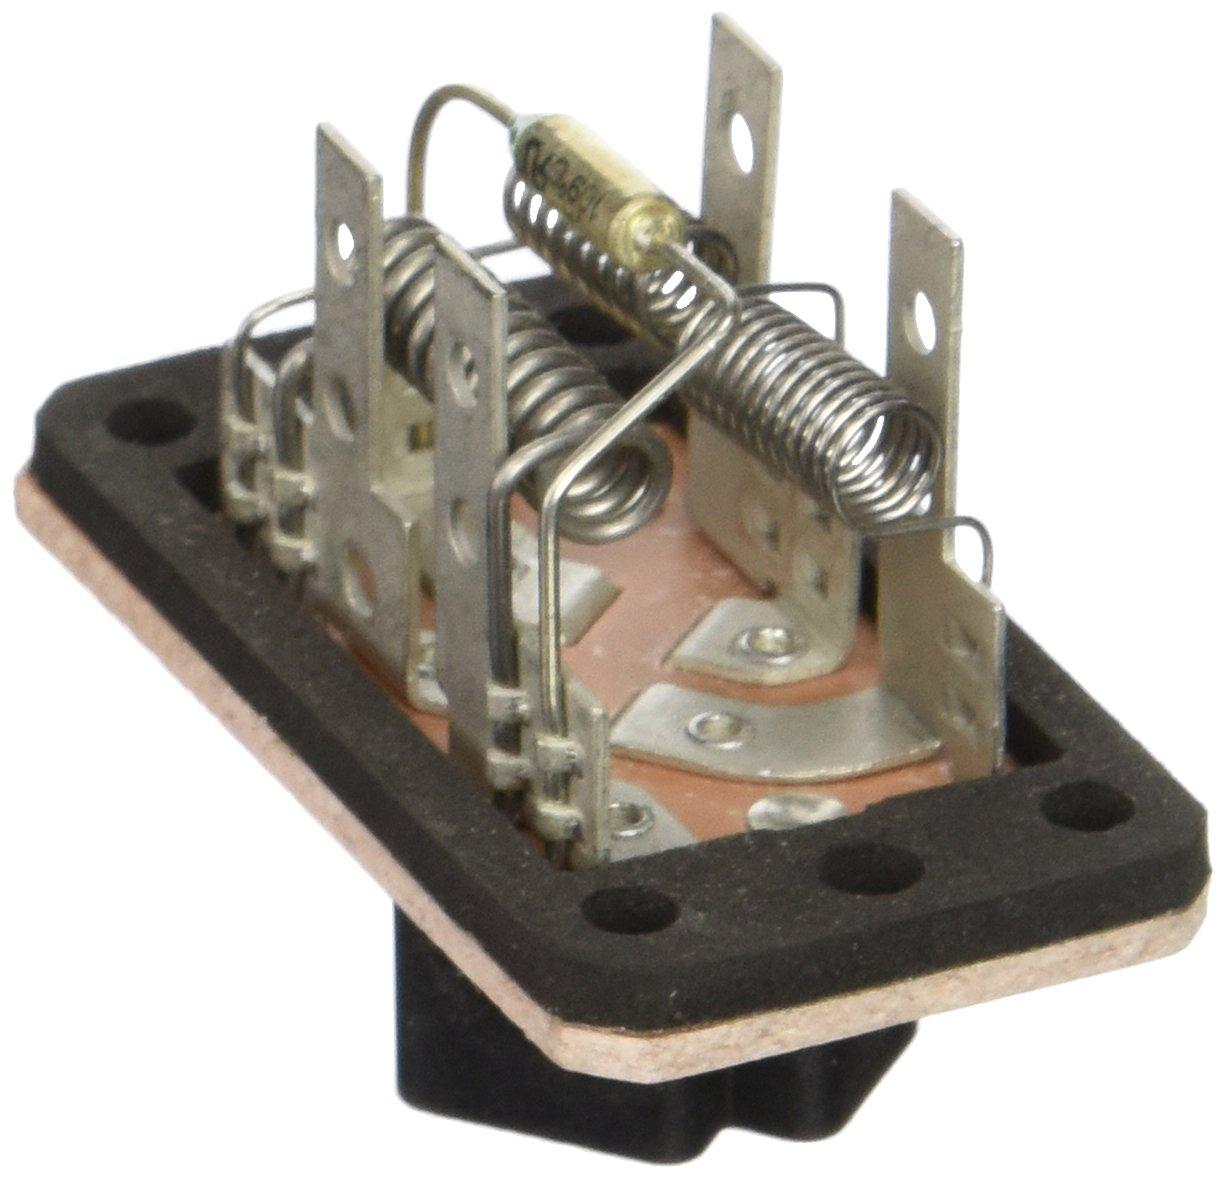 Motorcraft YH-1699 Blower Motor Resistor